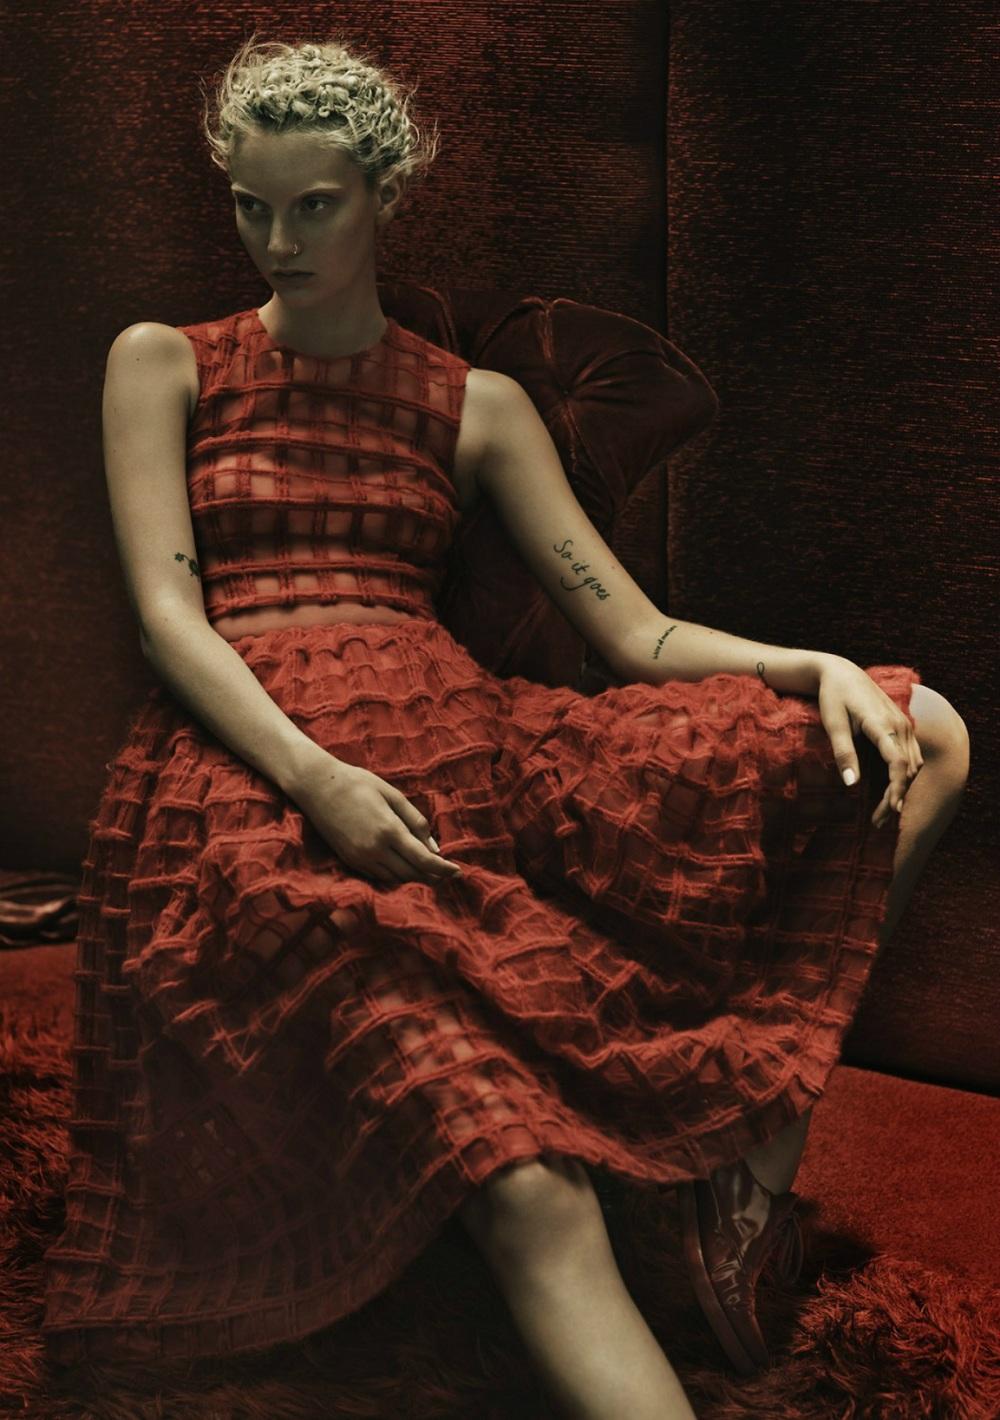 Rory-Payne-Codie-Young-Twin-Magazine-4.jpg